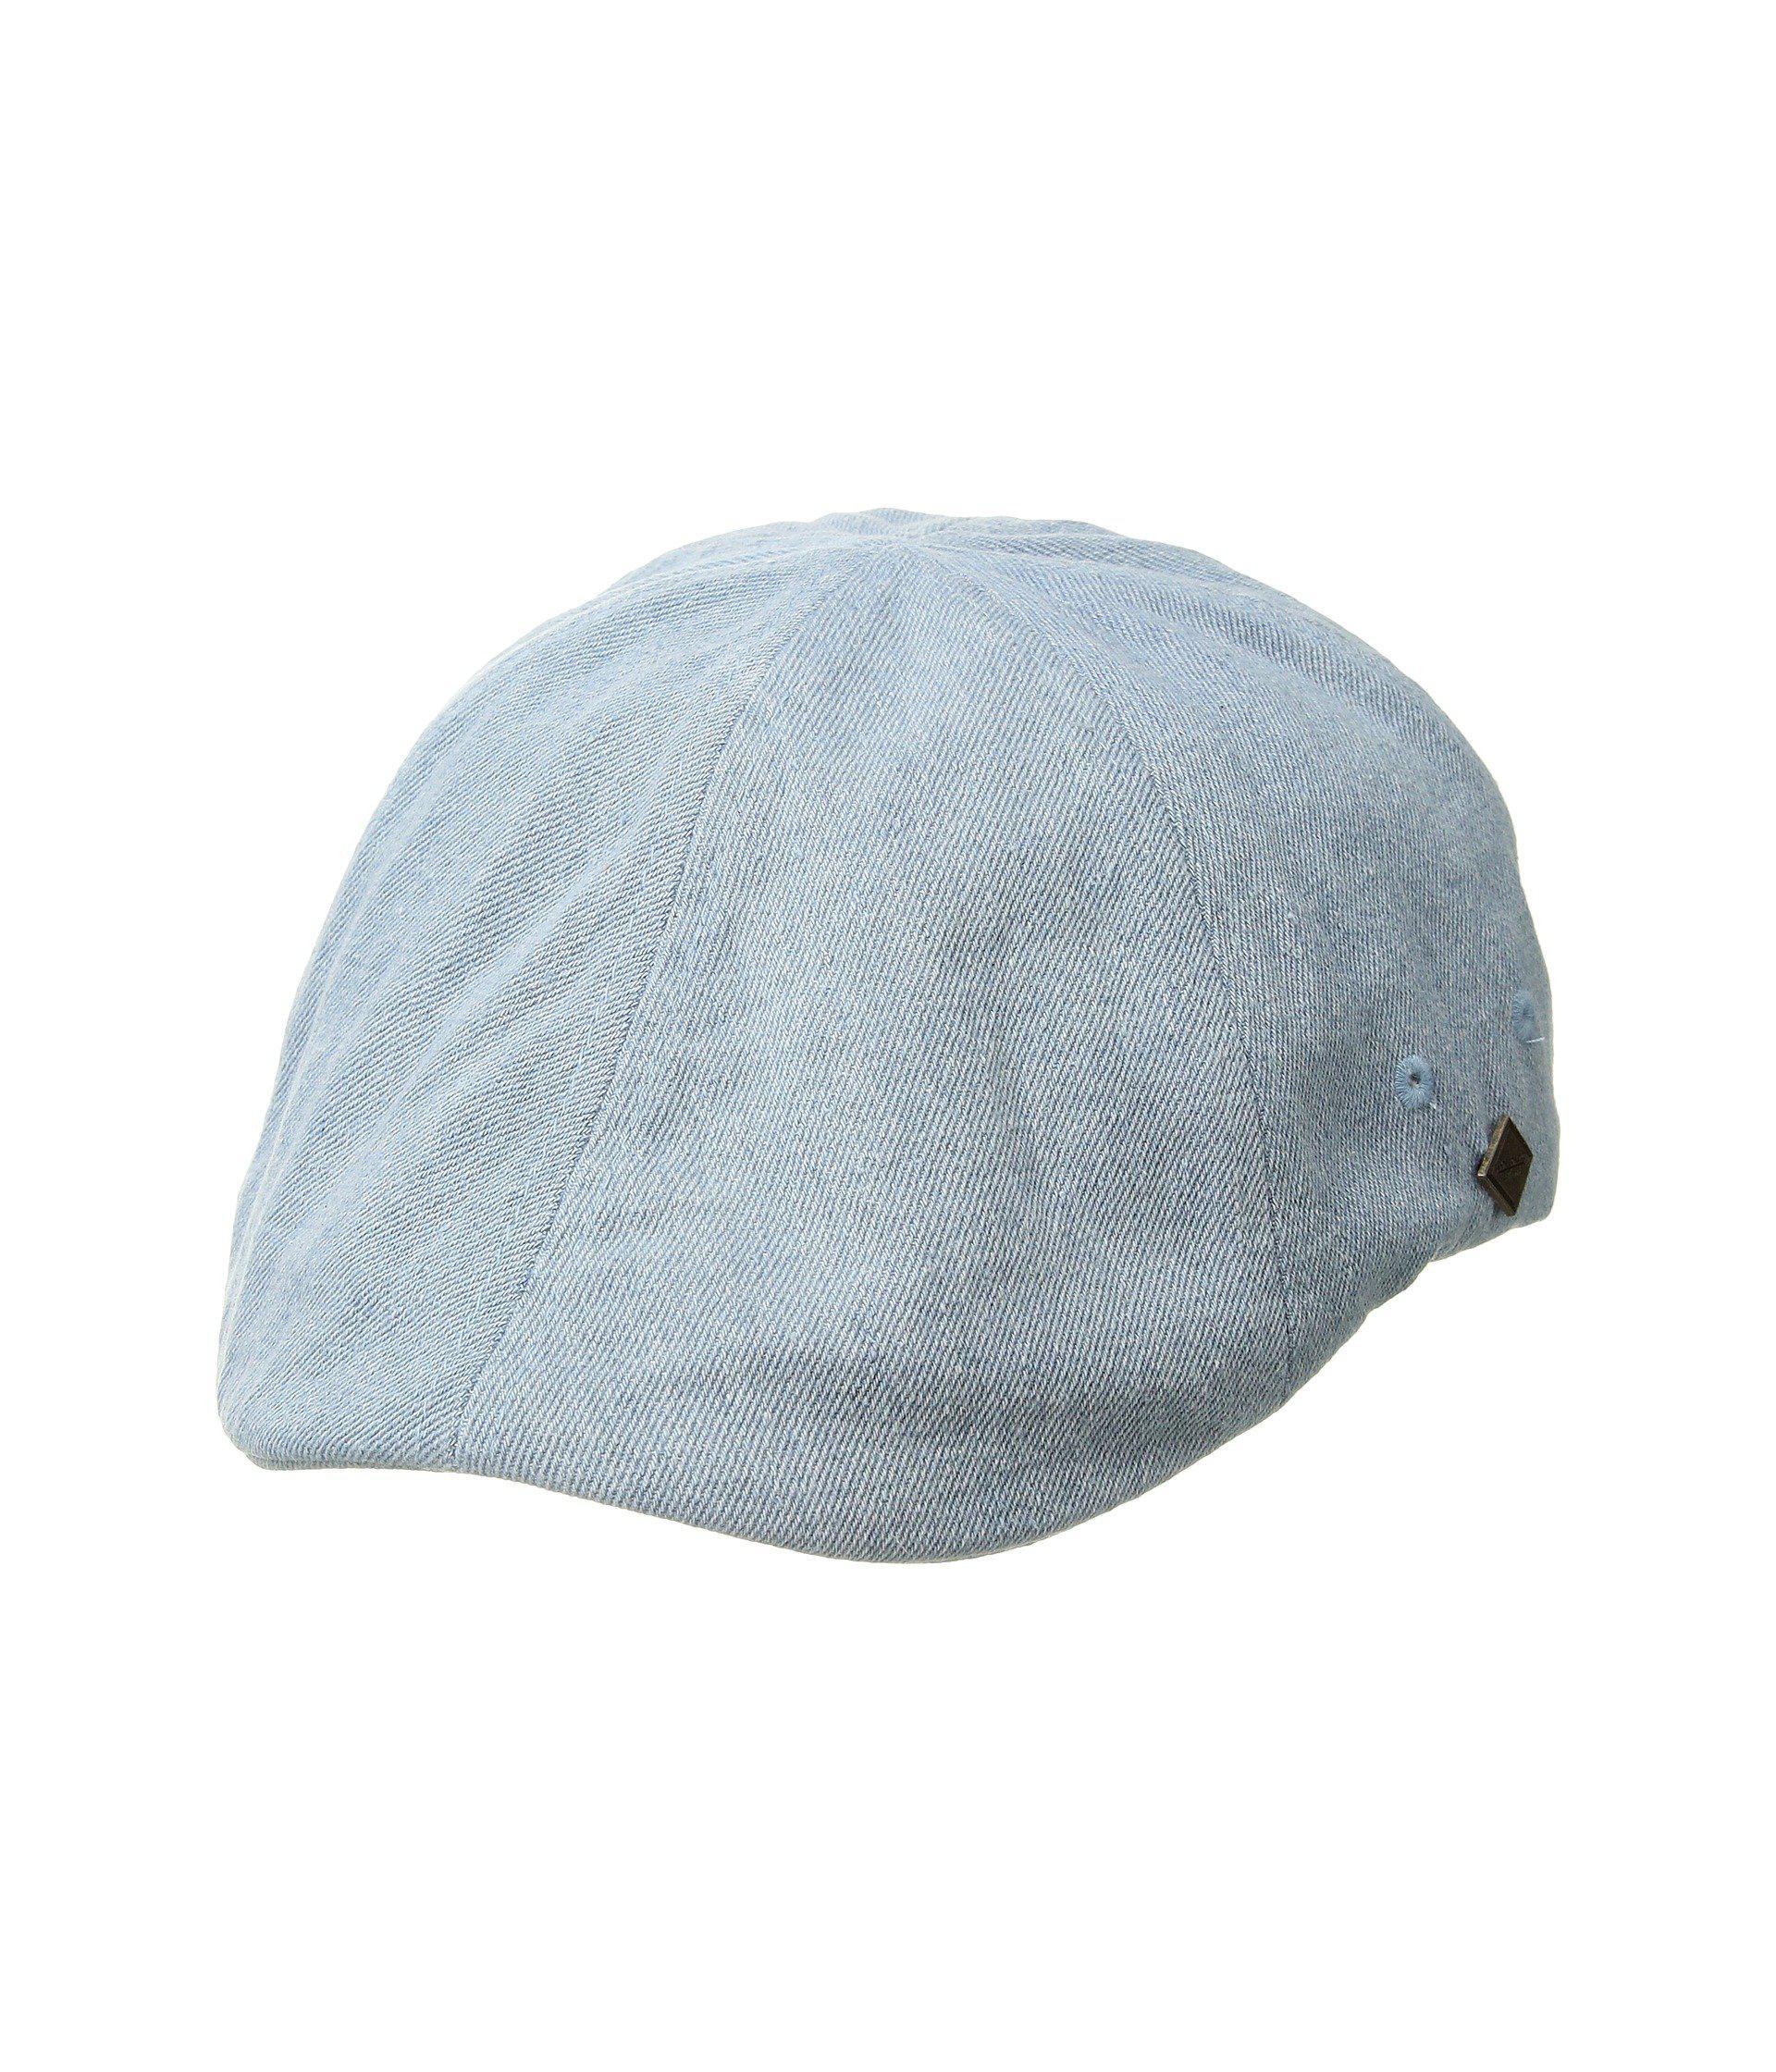 Lyst - San Diego Hat Company Washed Denim Driver (denim) Caps in ... 594238a615ca